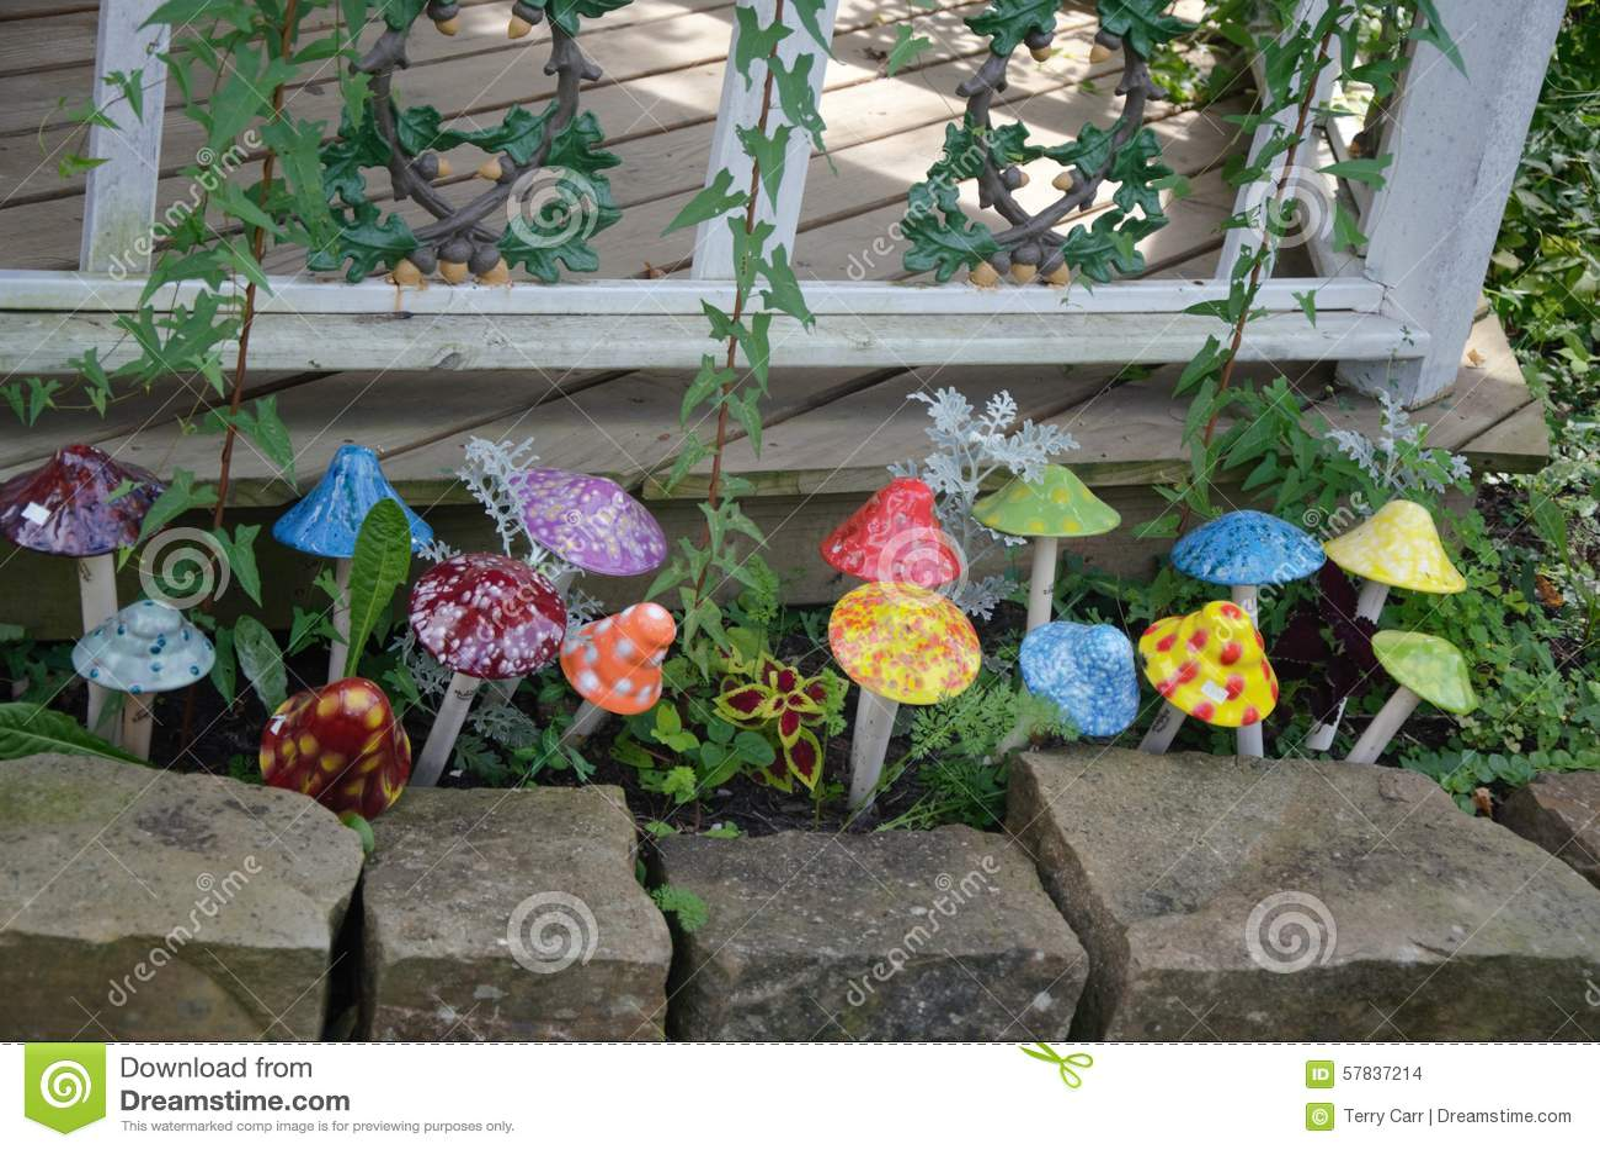 Decorative Artificial Mushrooms